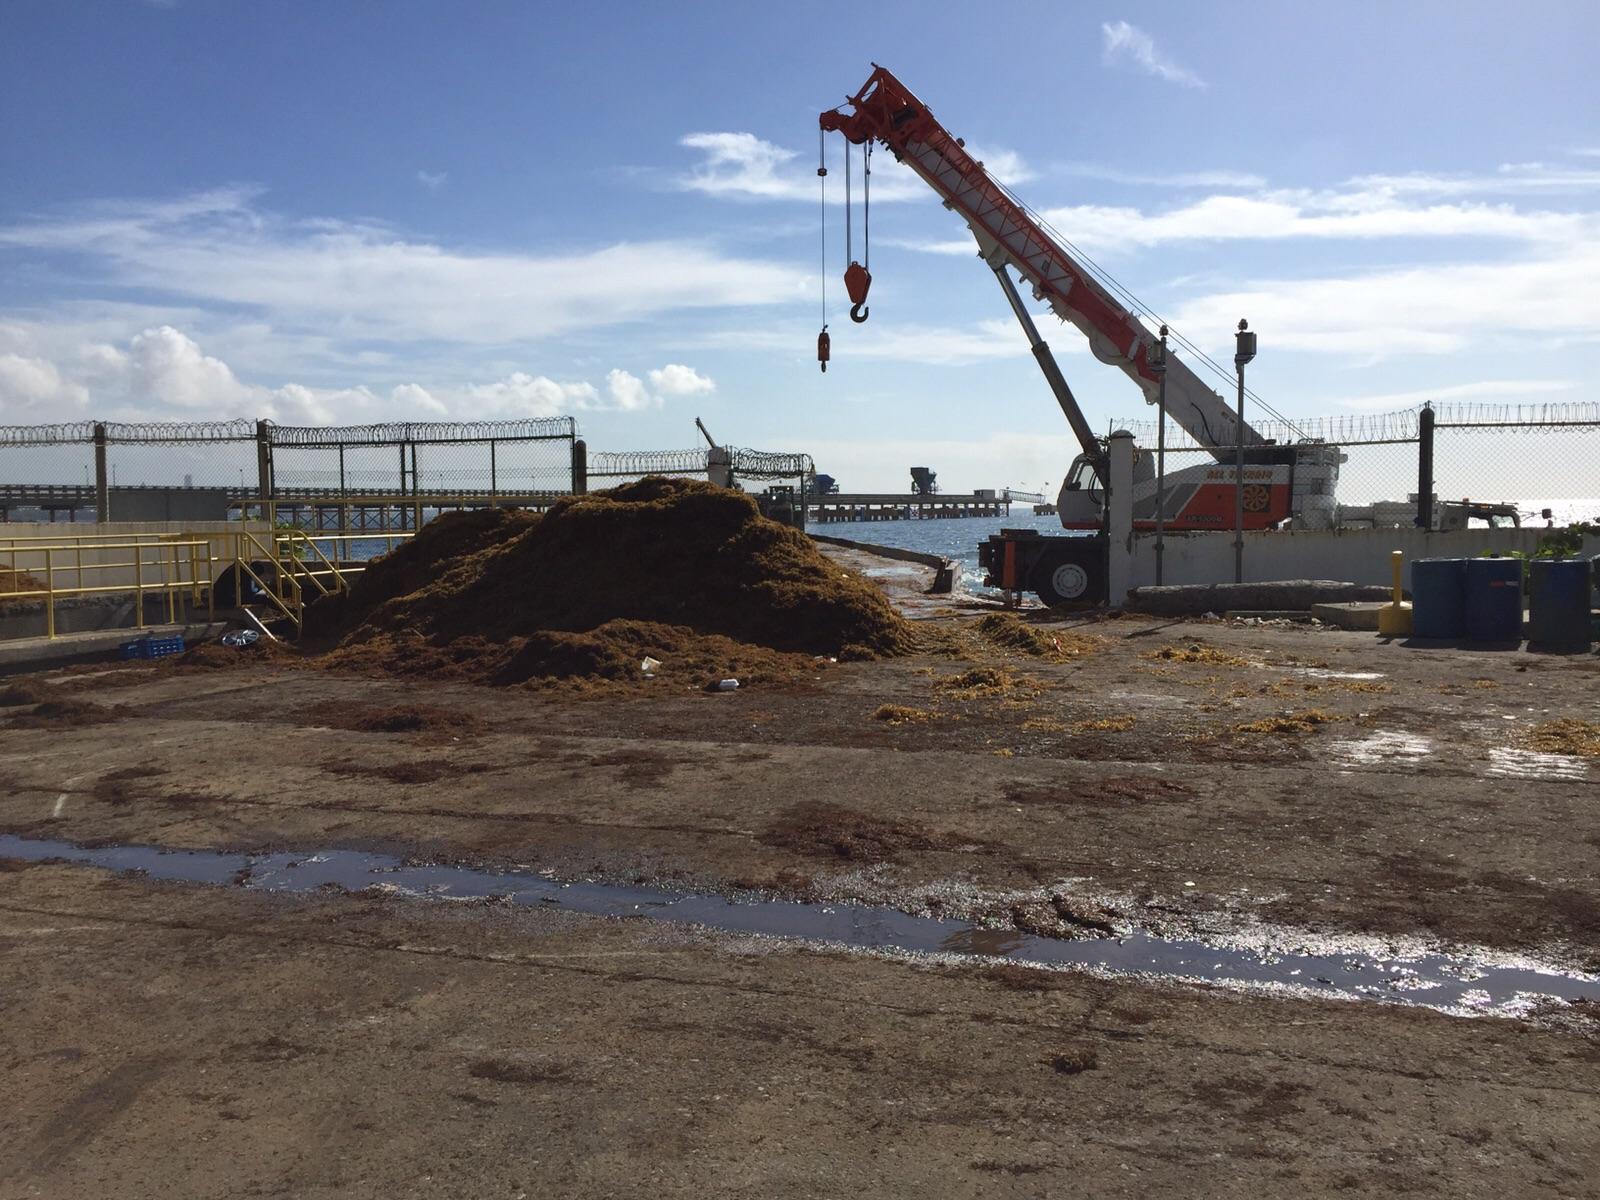 AES Dominicana revela está siendo afectadapor llegada masiva de algas